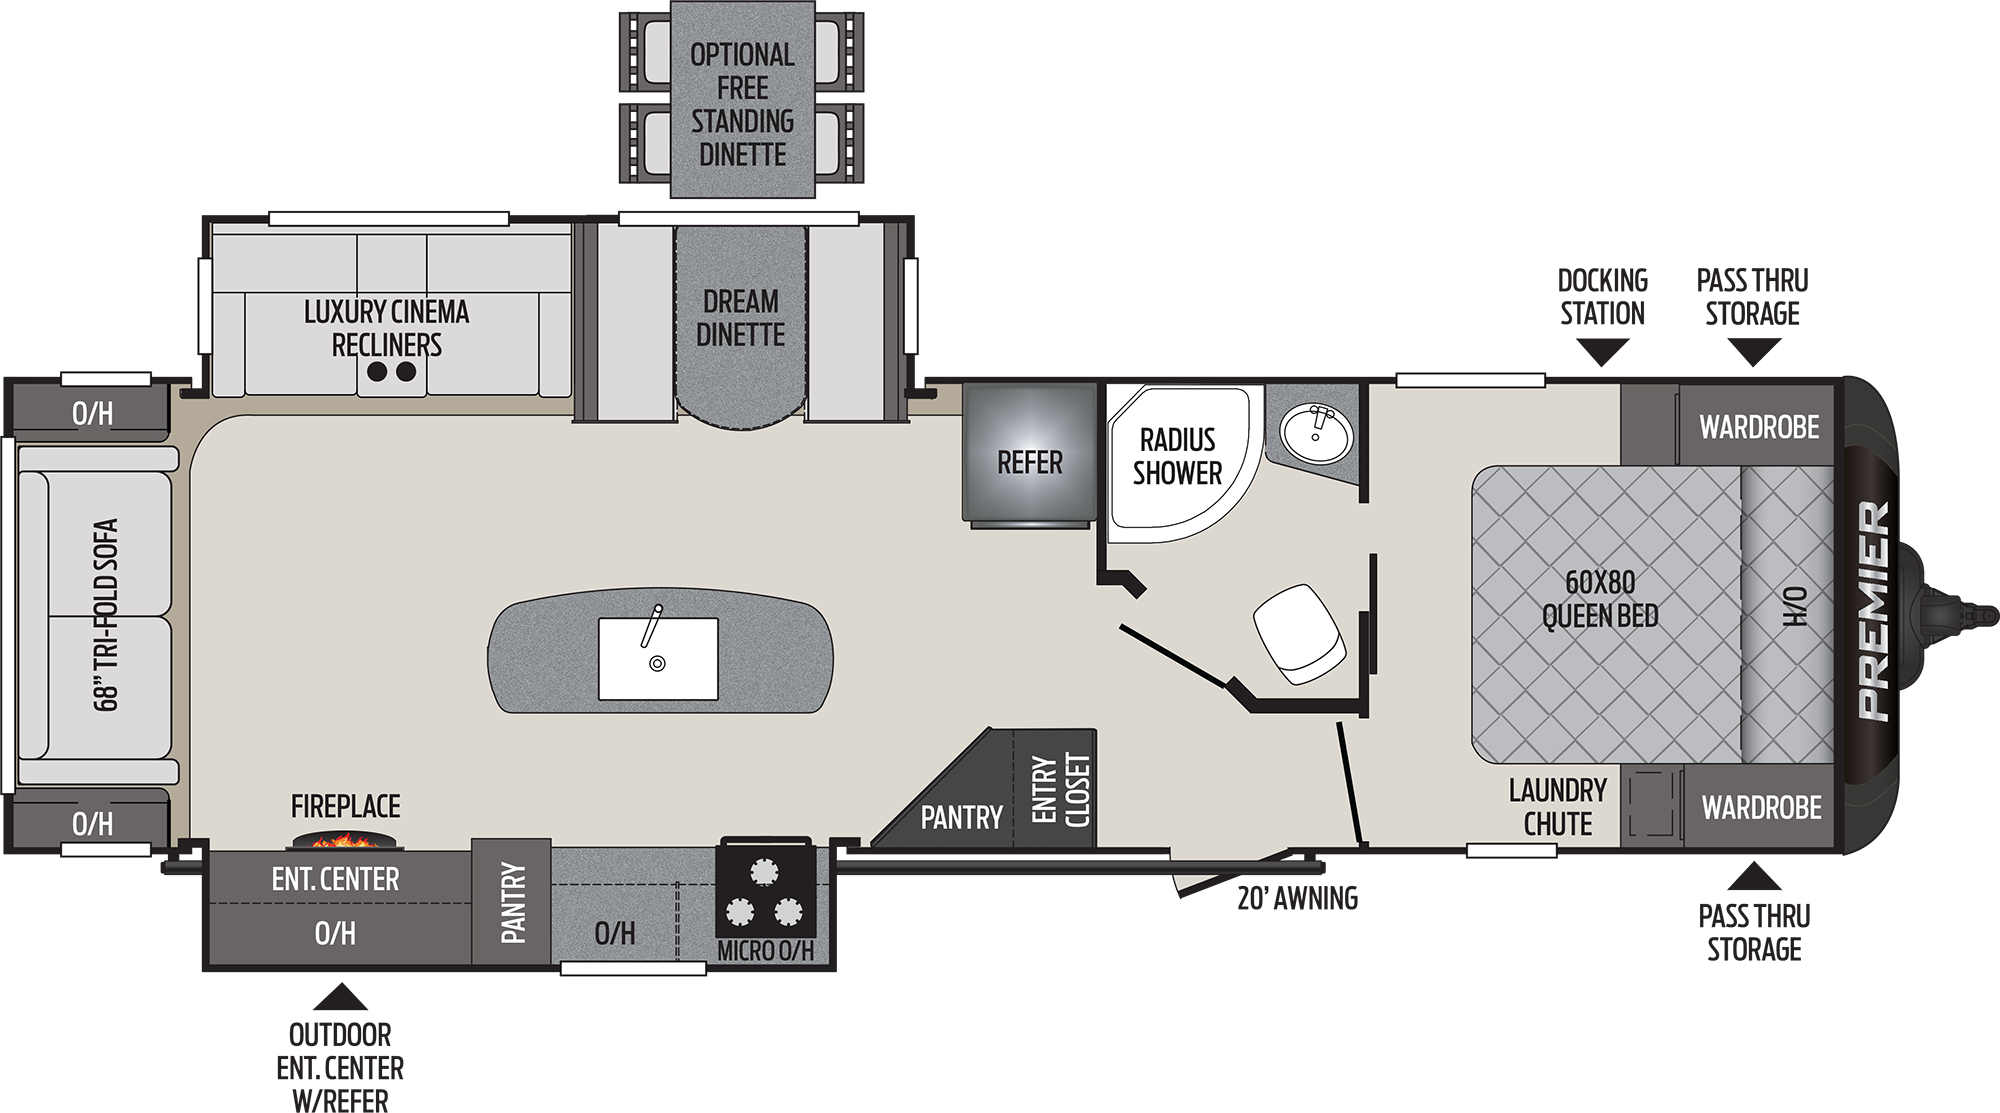 2020 KEYSTONE PREMIER 30RIPR (couples) Floorplan